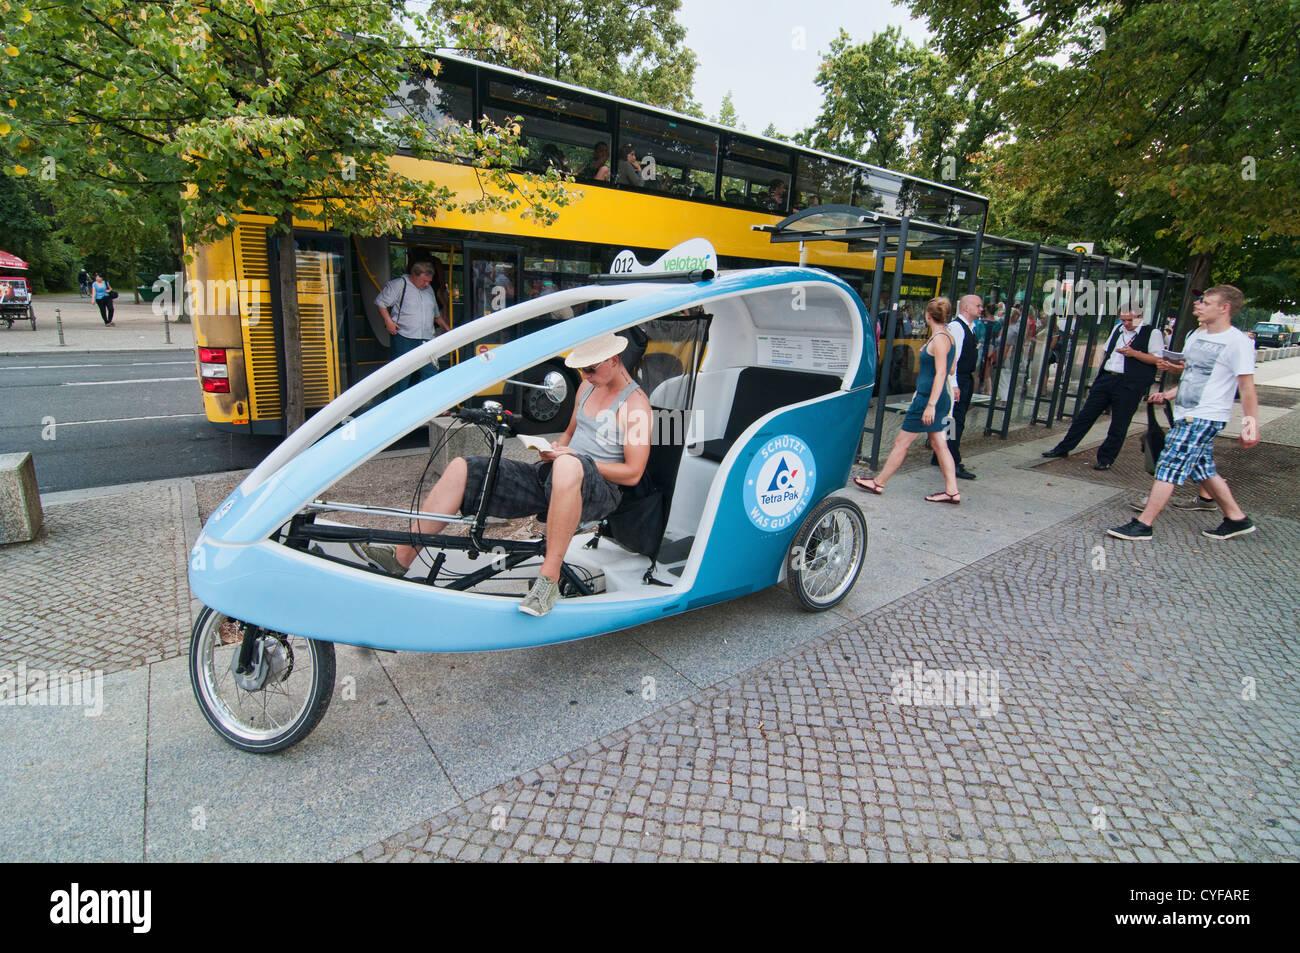 Alternative Verkehrsmittel in Berlin, Deutschland Stockbild